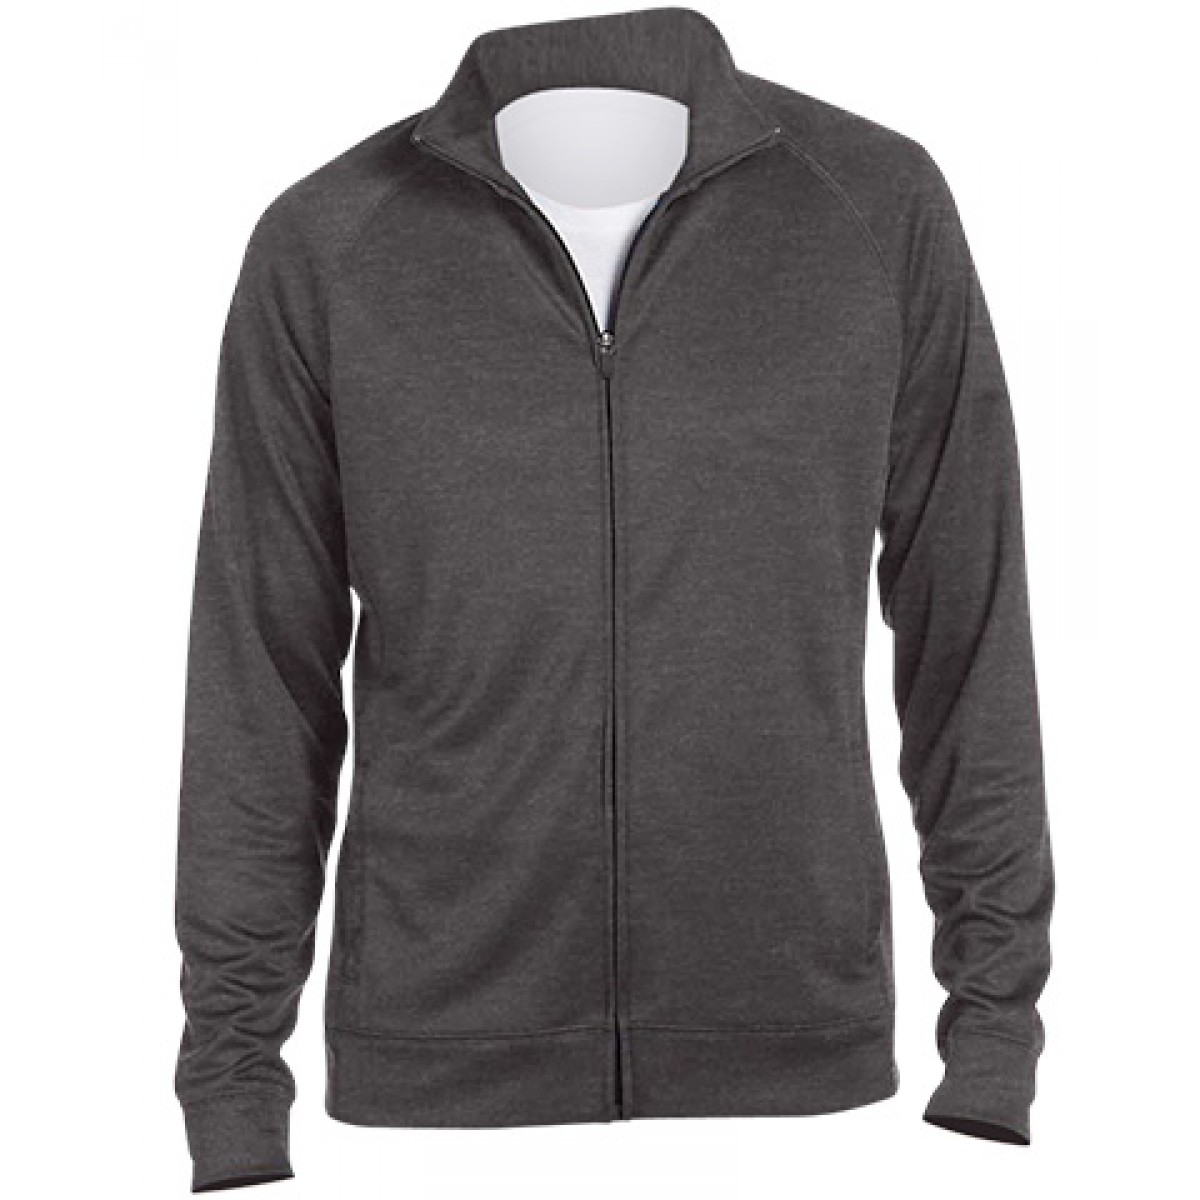 Men's Full Zip Lightweight Sports Jacket